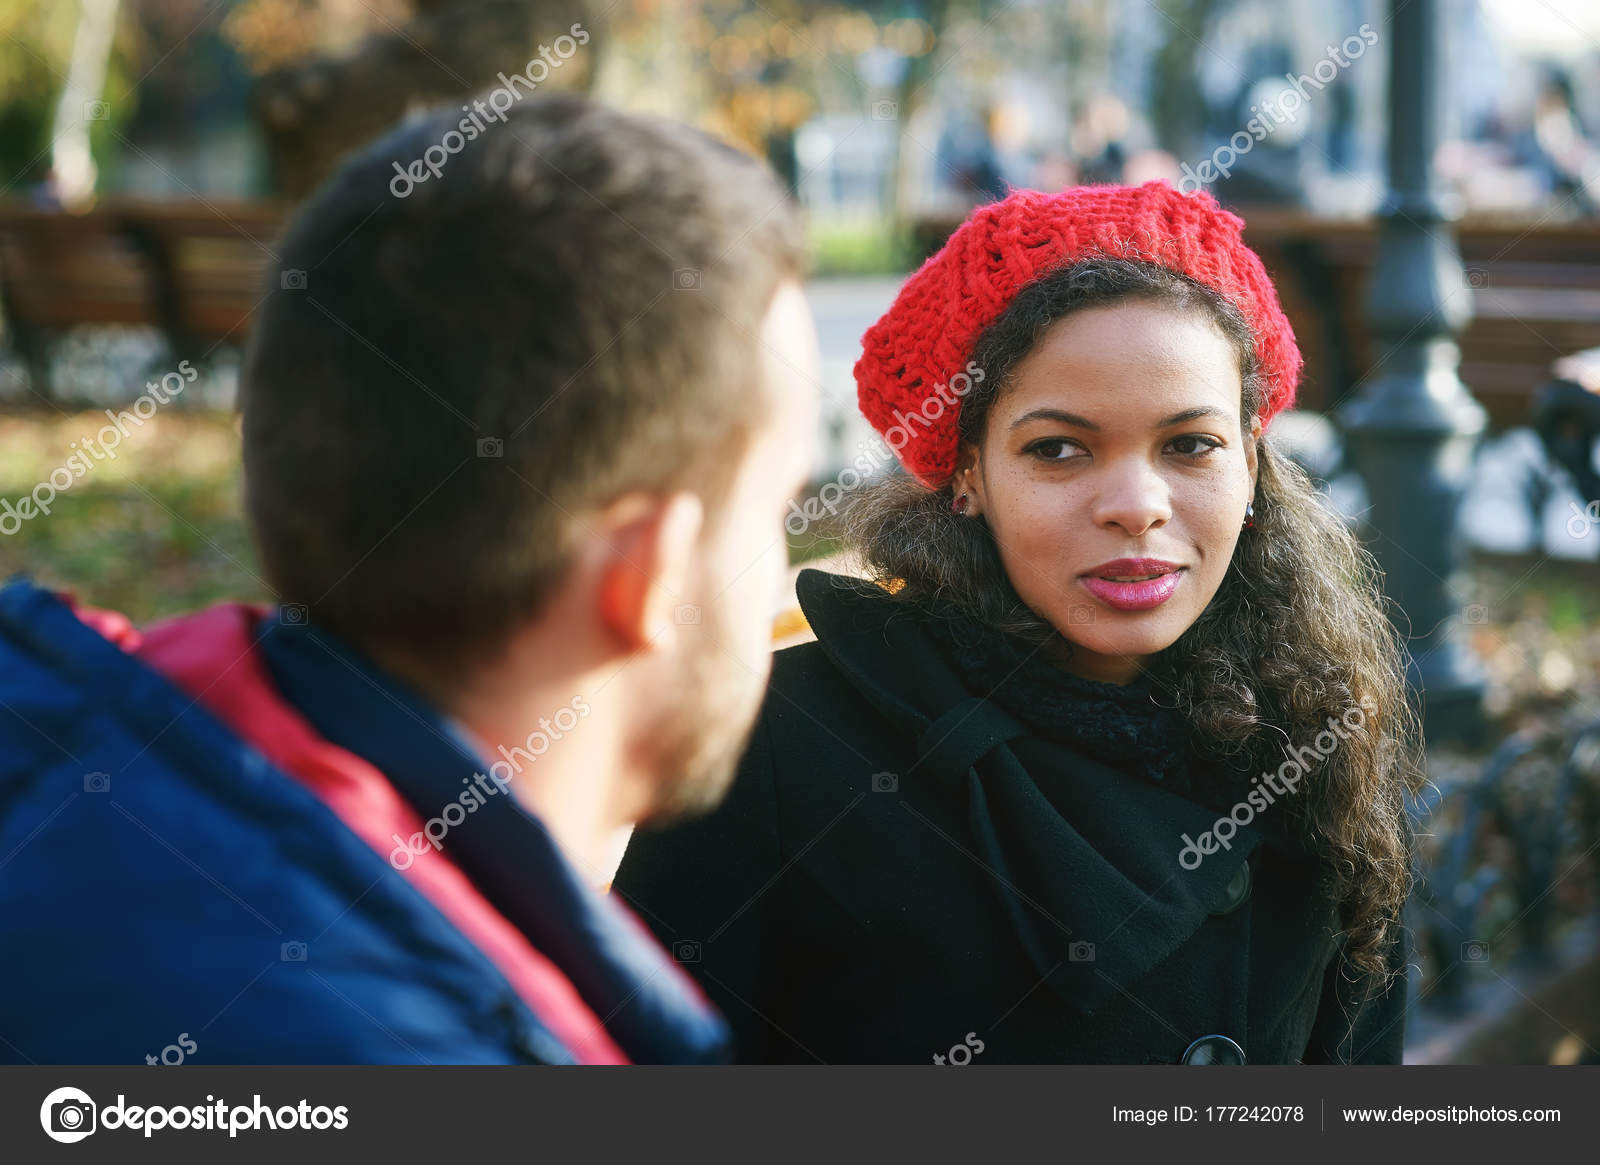 Djenelle Datierung nathan